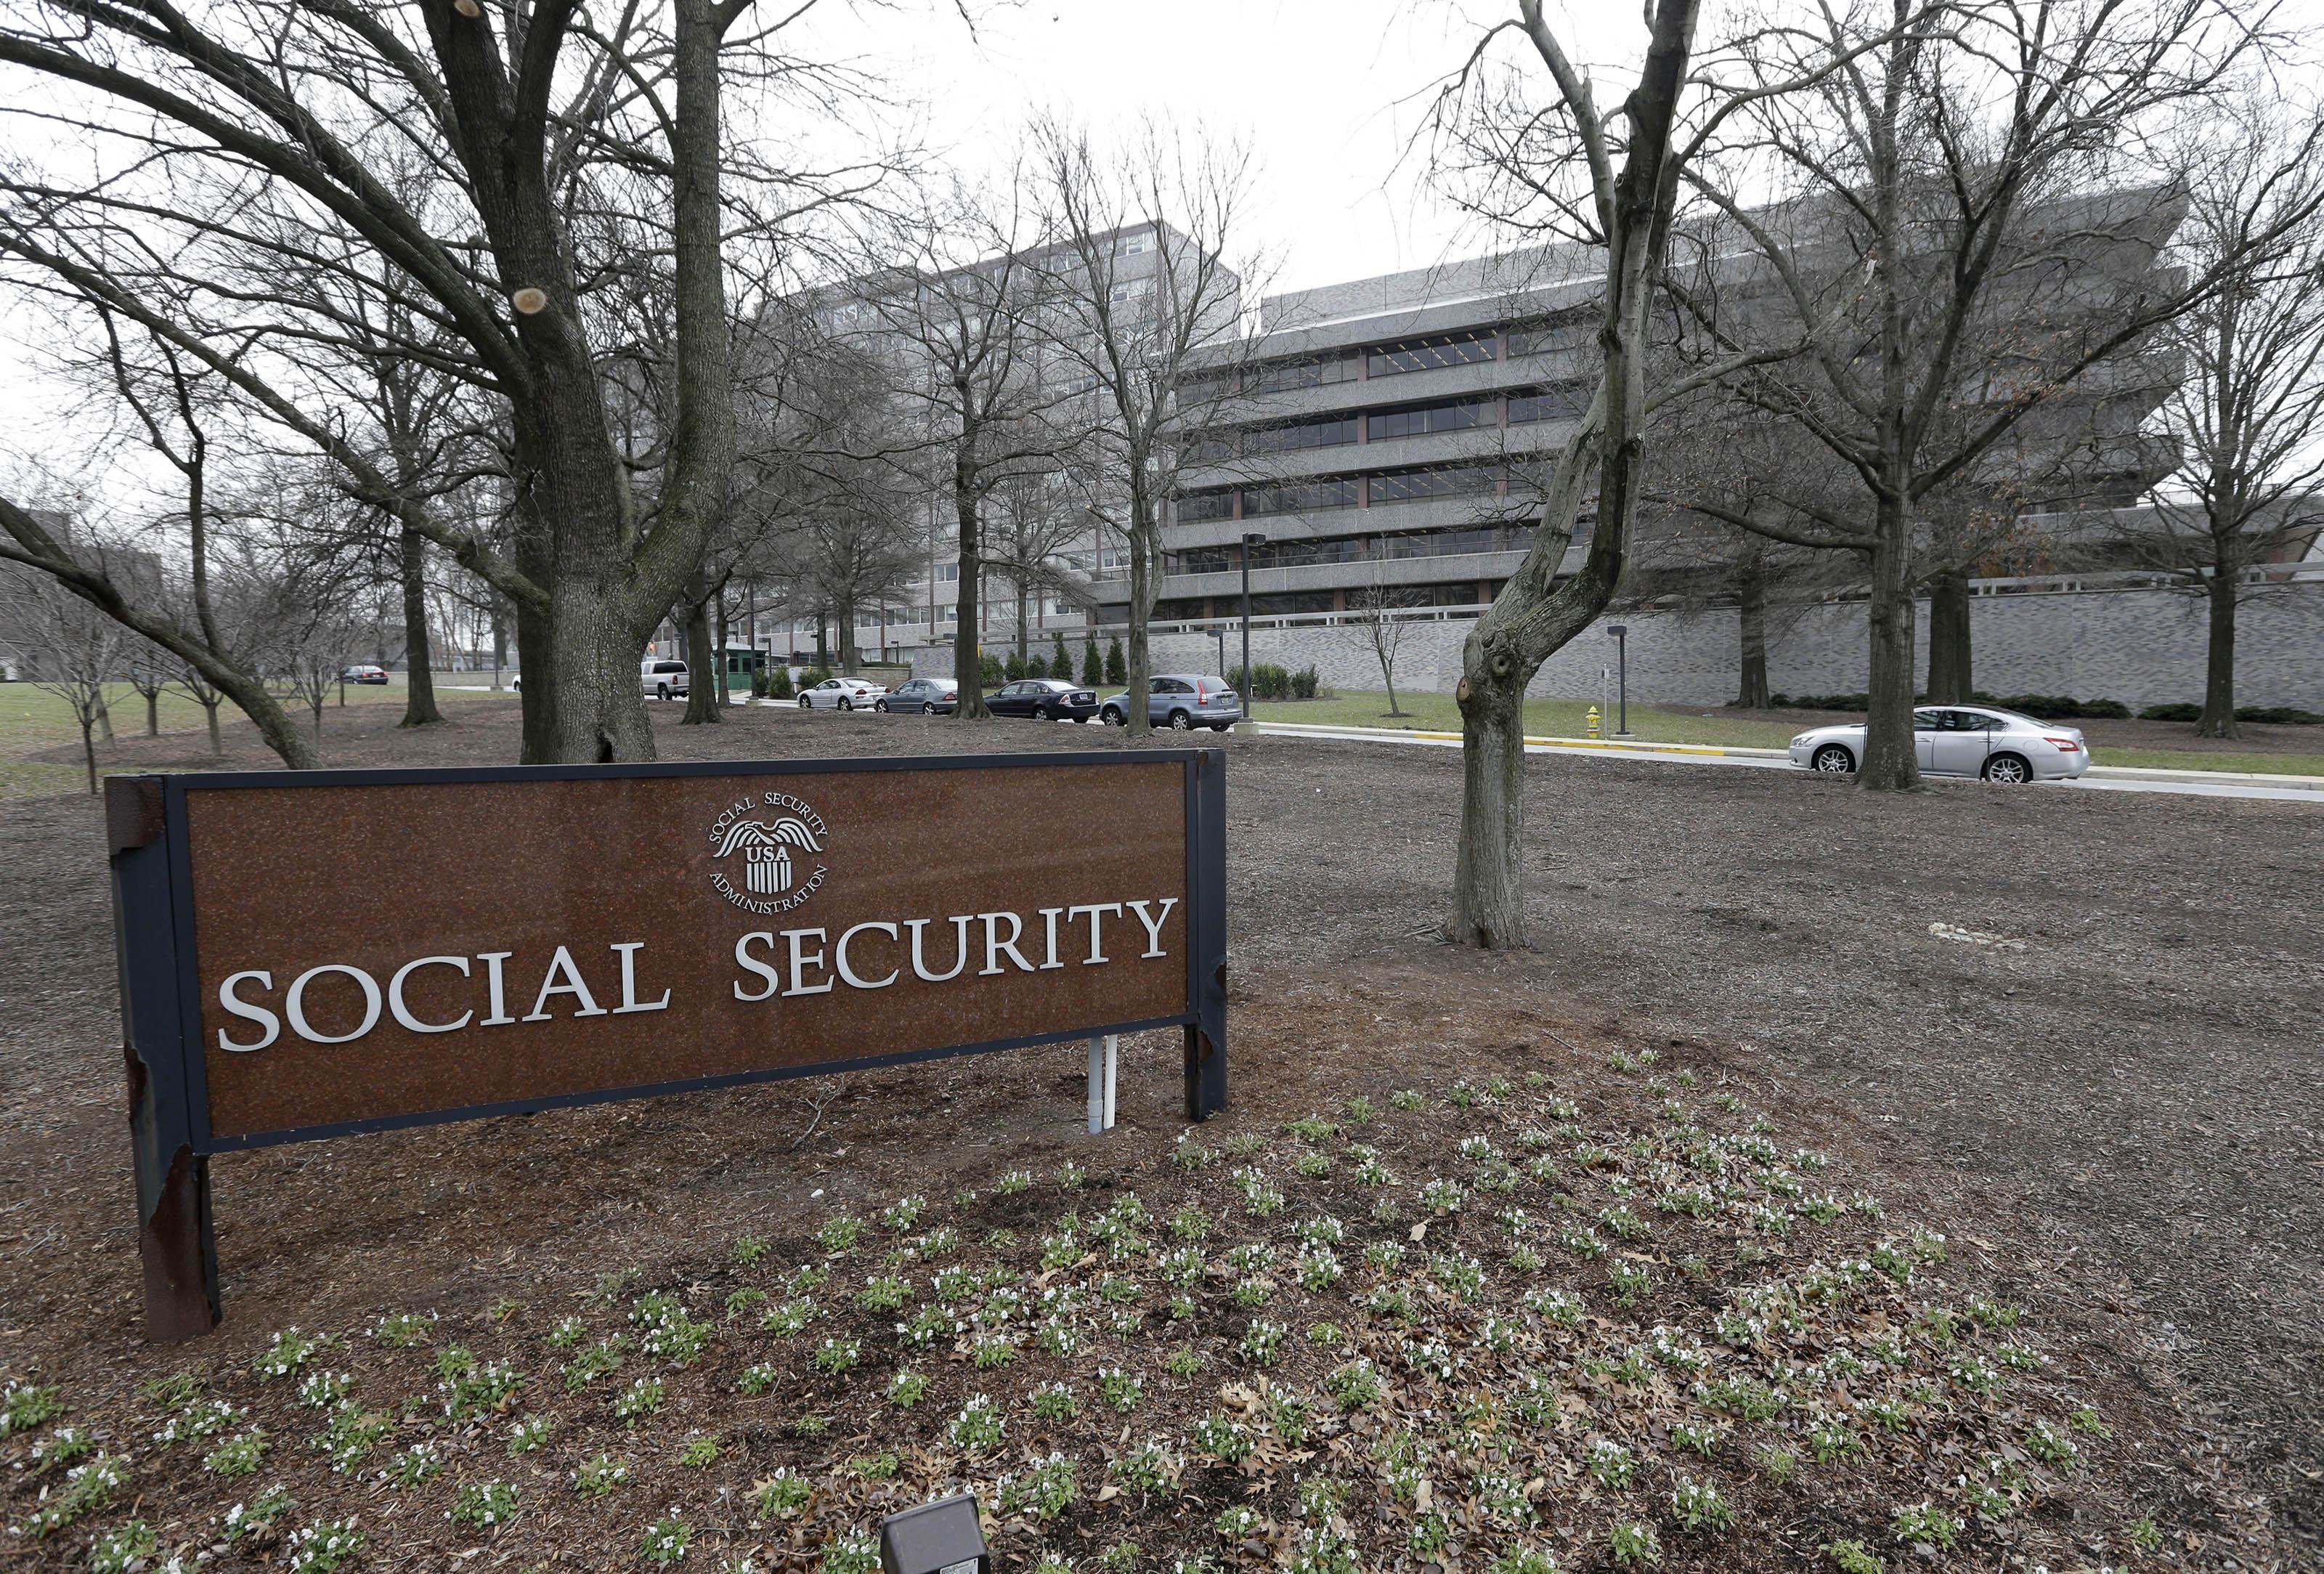 Sean Brune No estimates on how bad Social Security fraud is